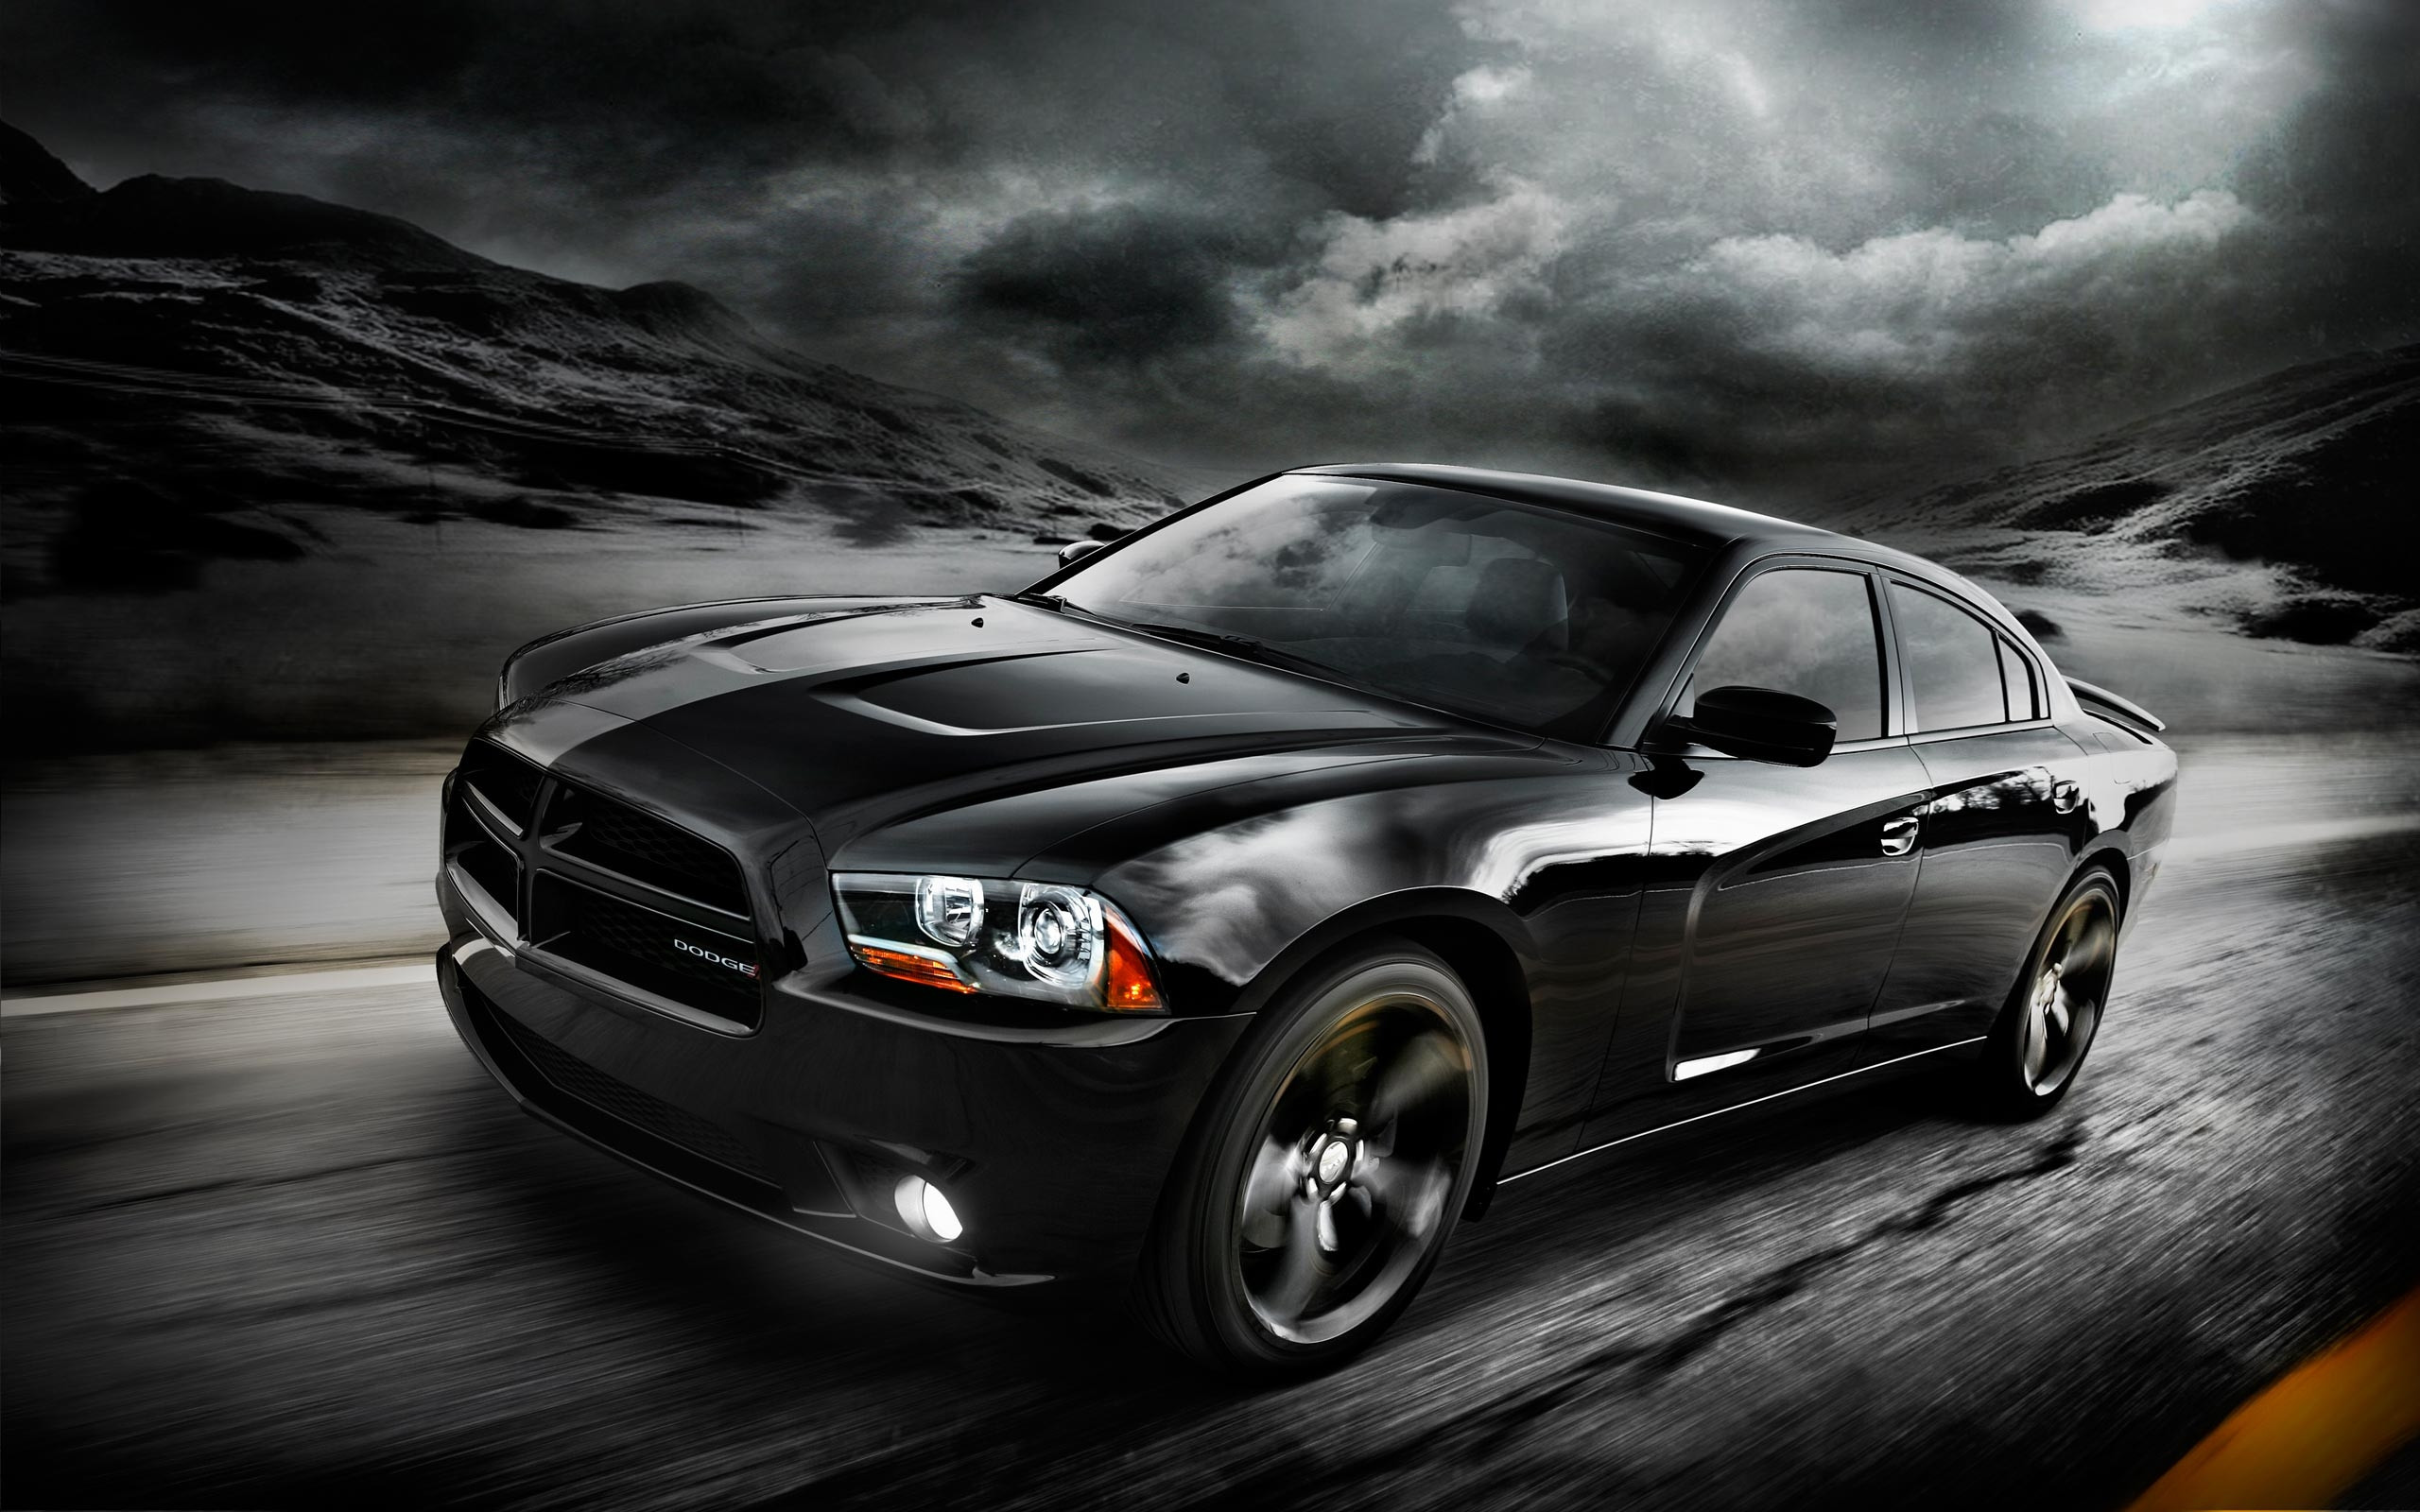 Dodge Challenger Background Wallpaper Photo Background .